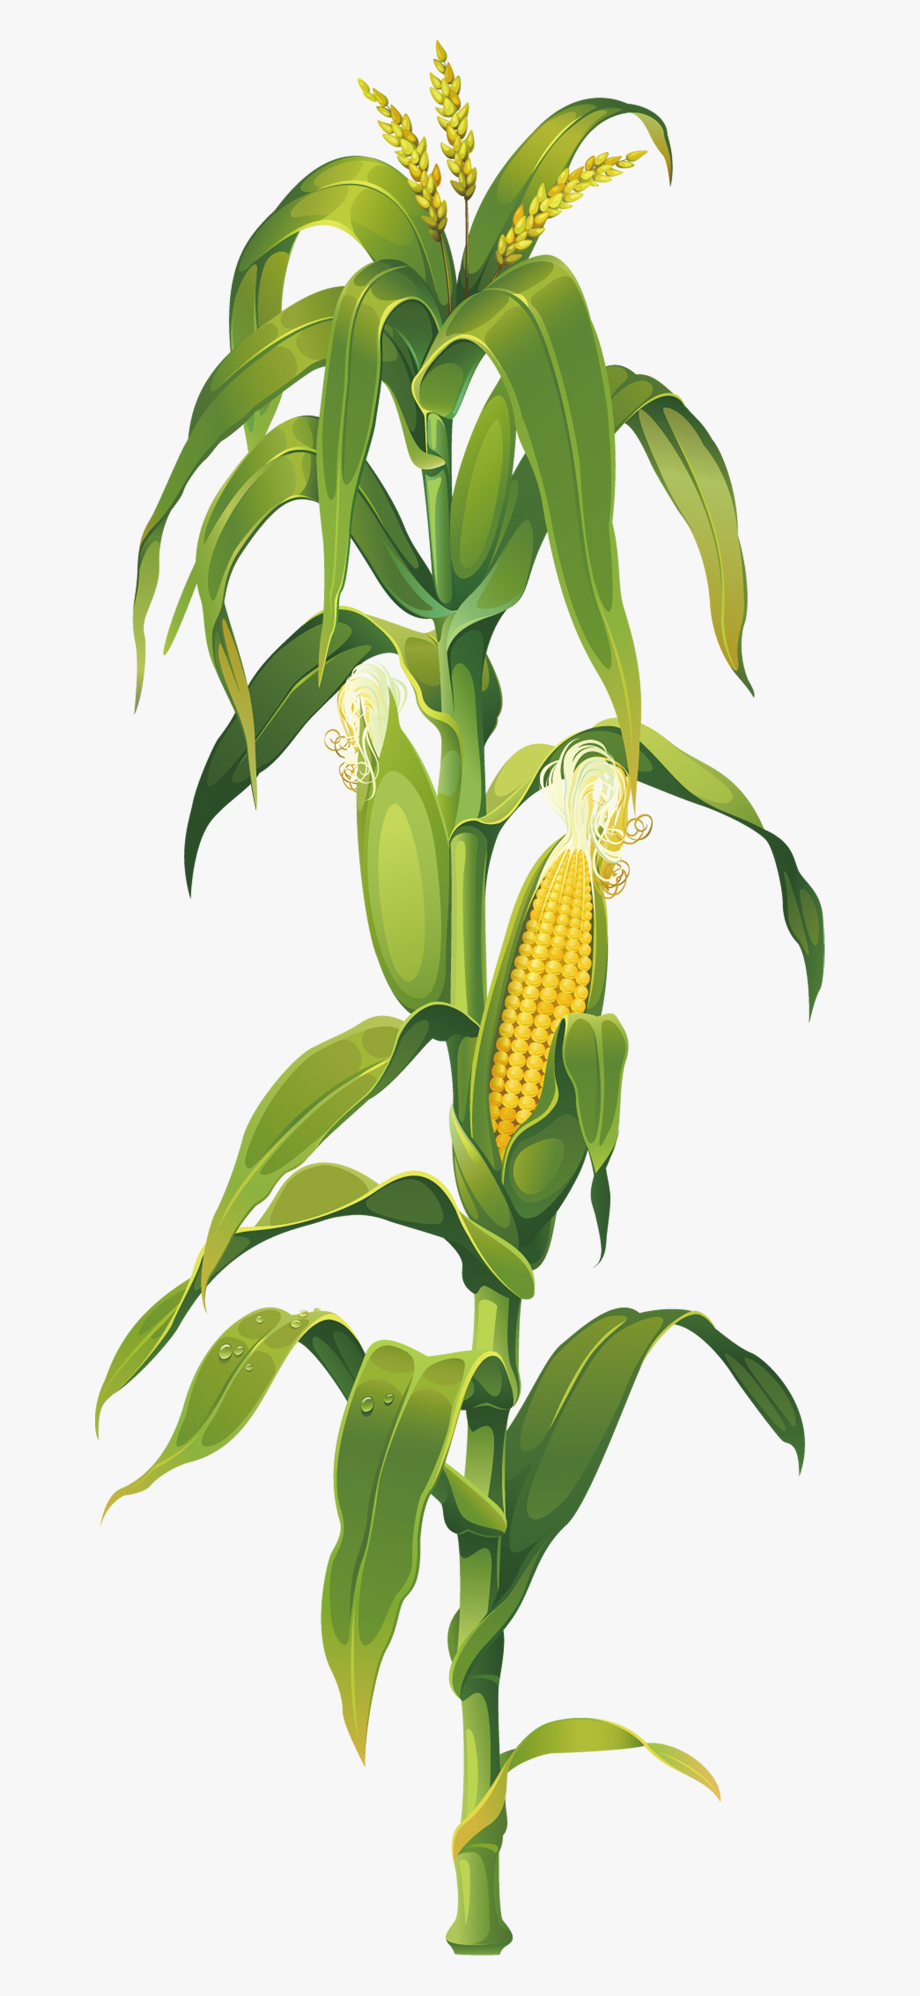 Corn Clipart Png.